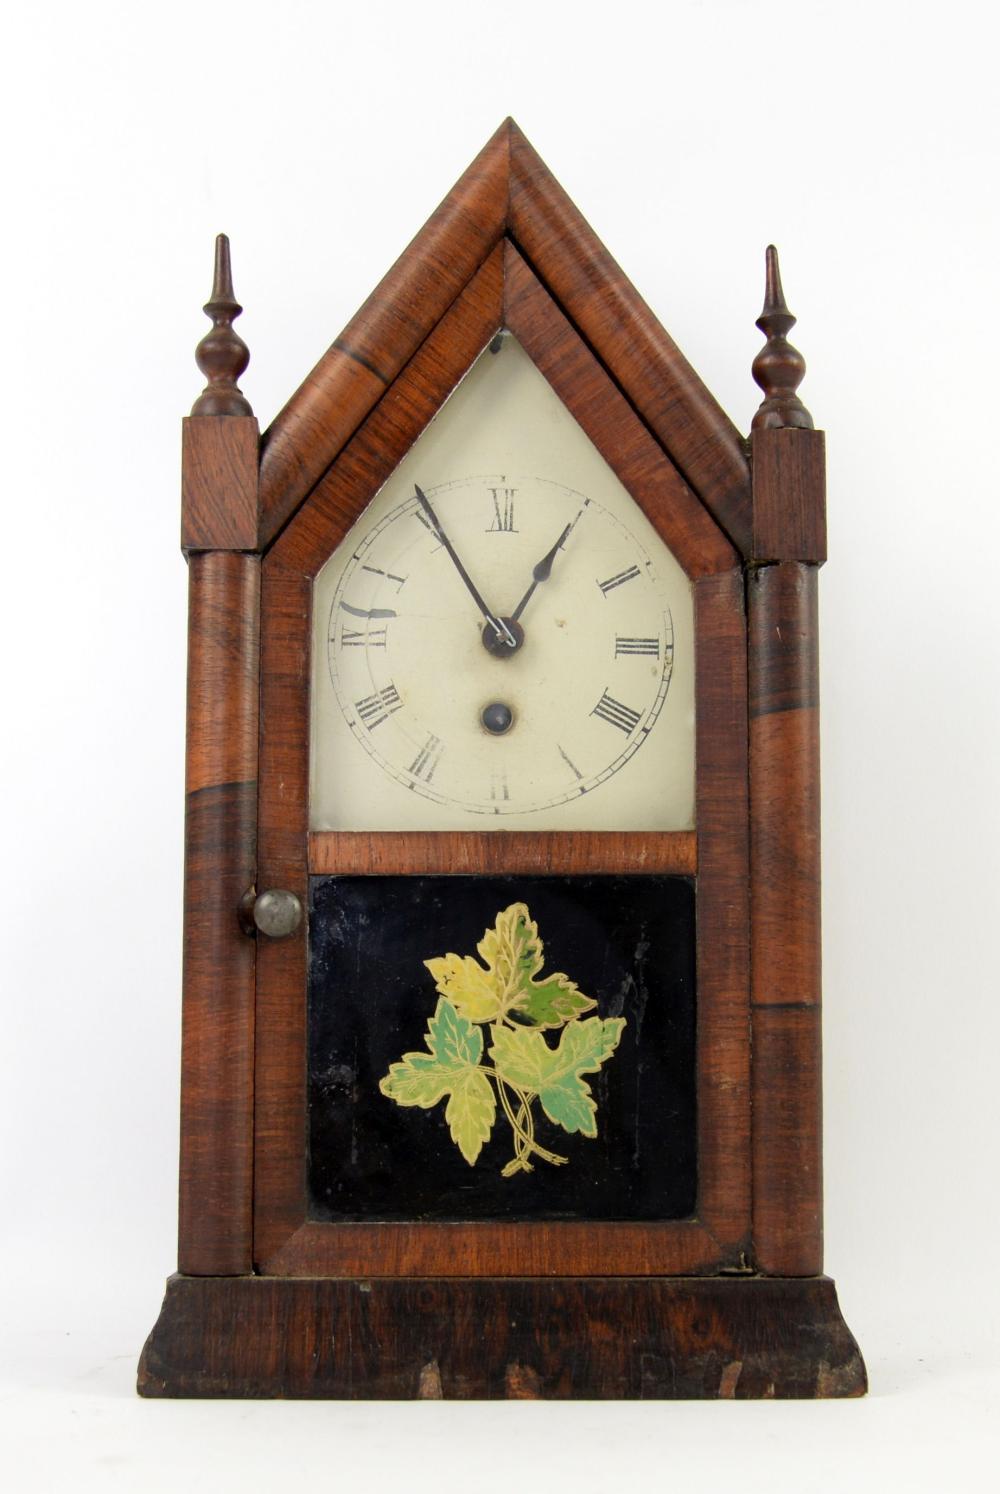 Mid 19th century American mantel clock with single